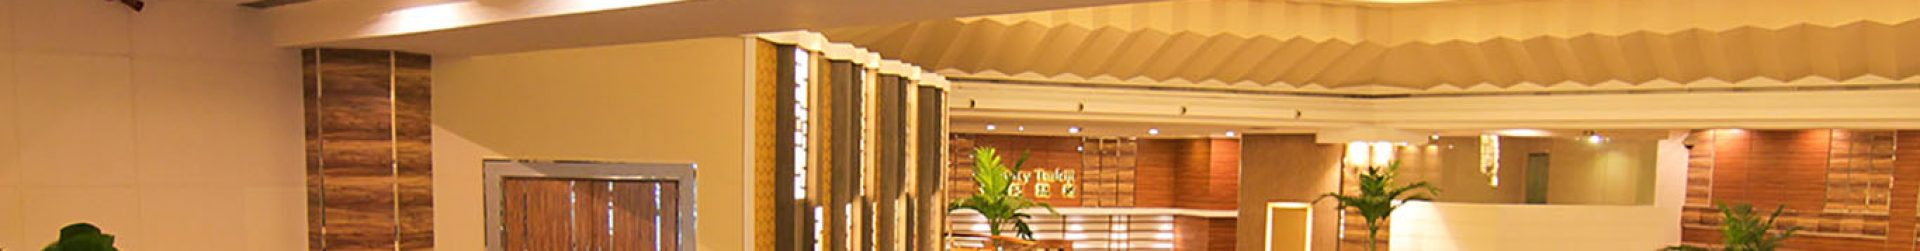 cropped-hotel1.jpg